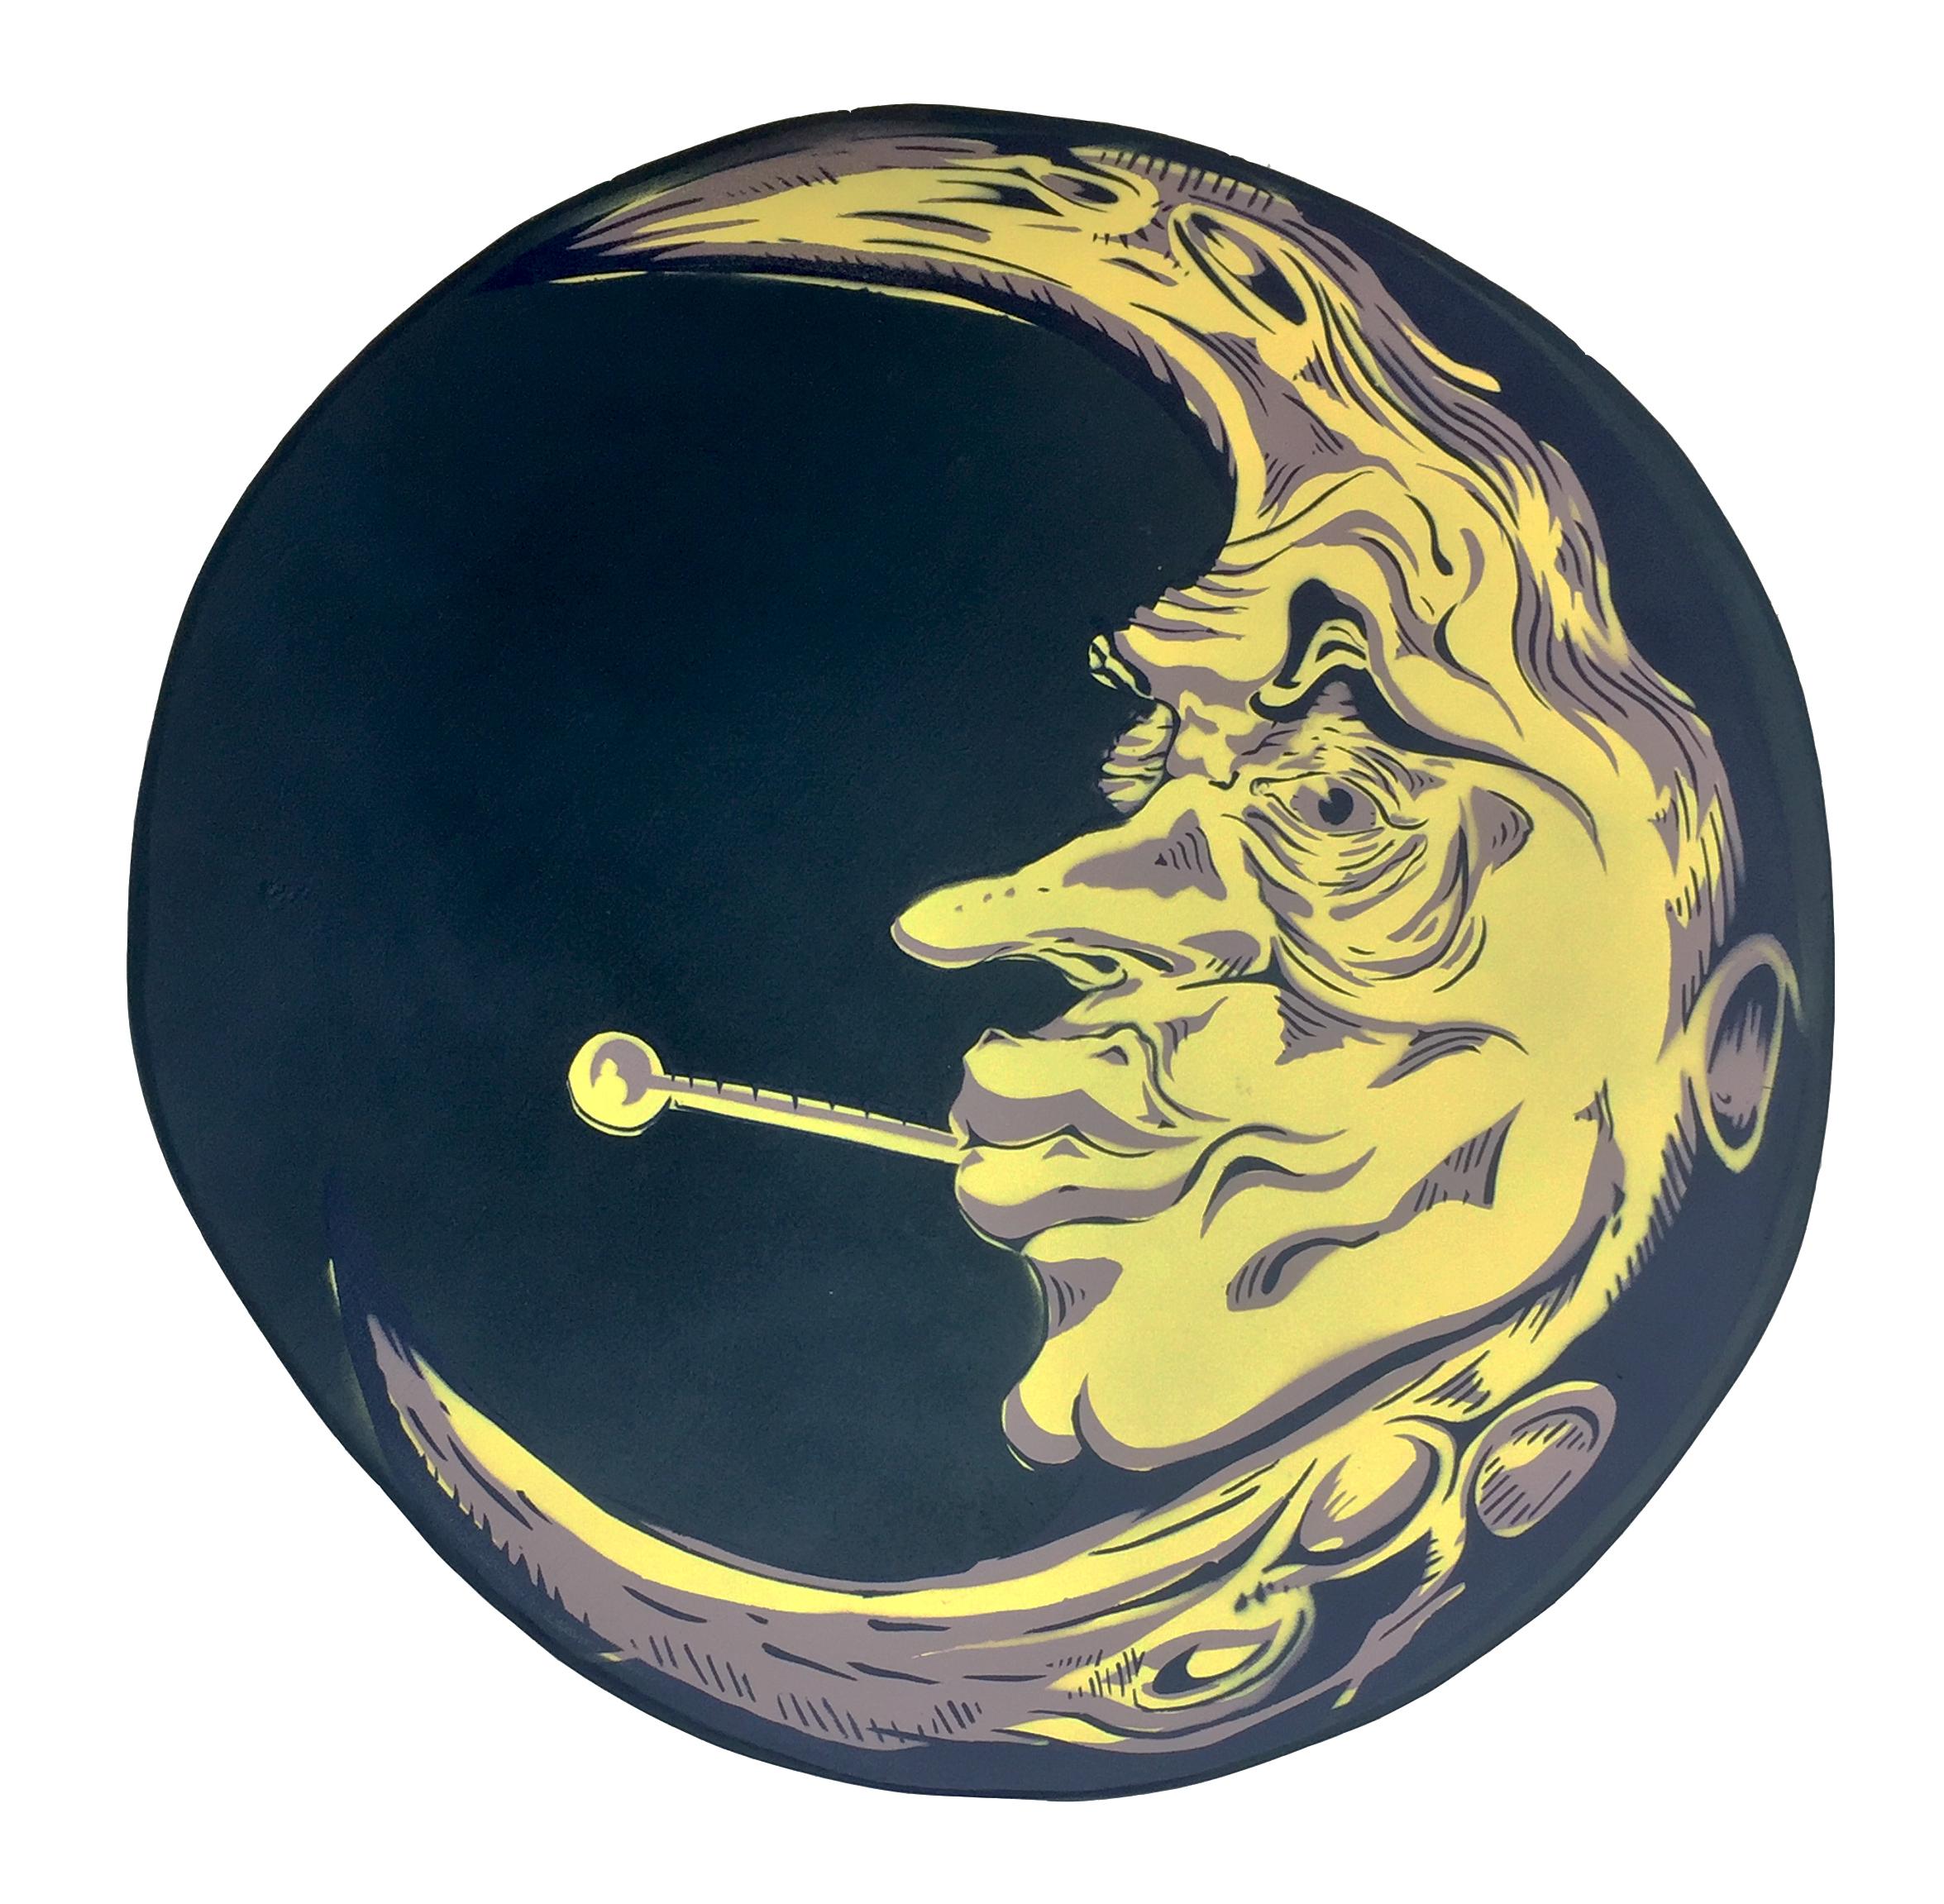 Ian Mondragon Fever Dreams, Stencil & Spray Paint on Panel, 26 x 26 in., $200 (1).jpg